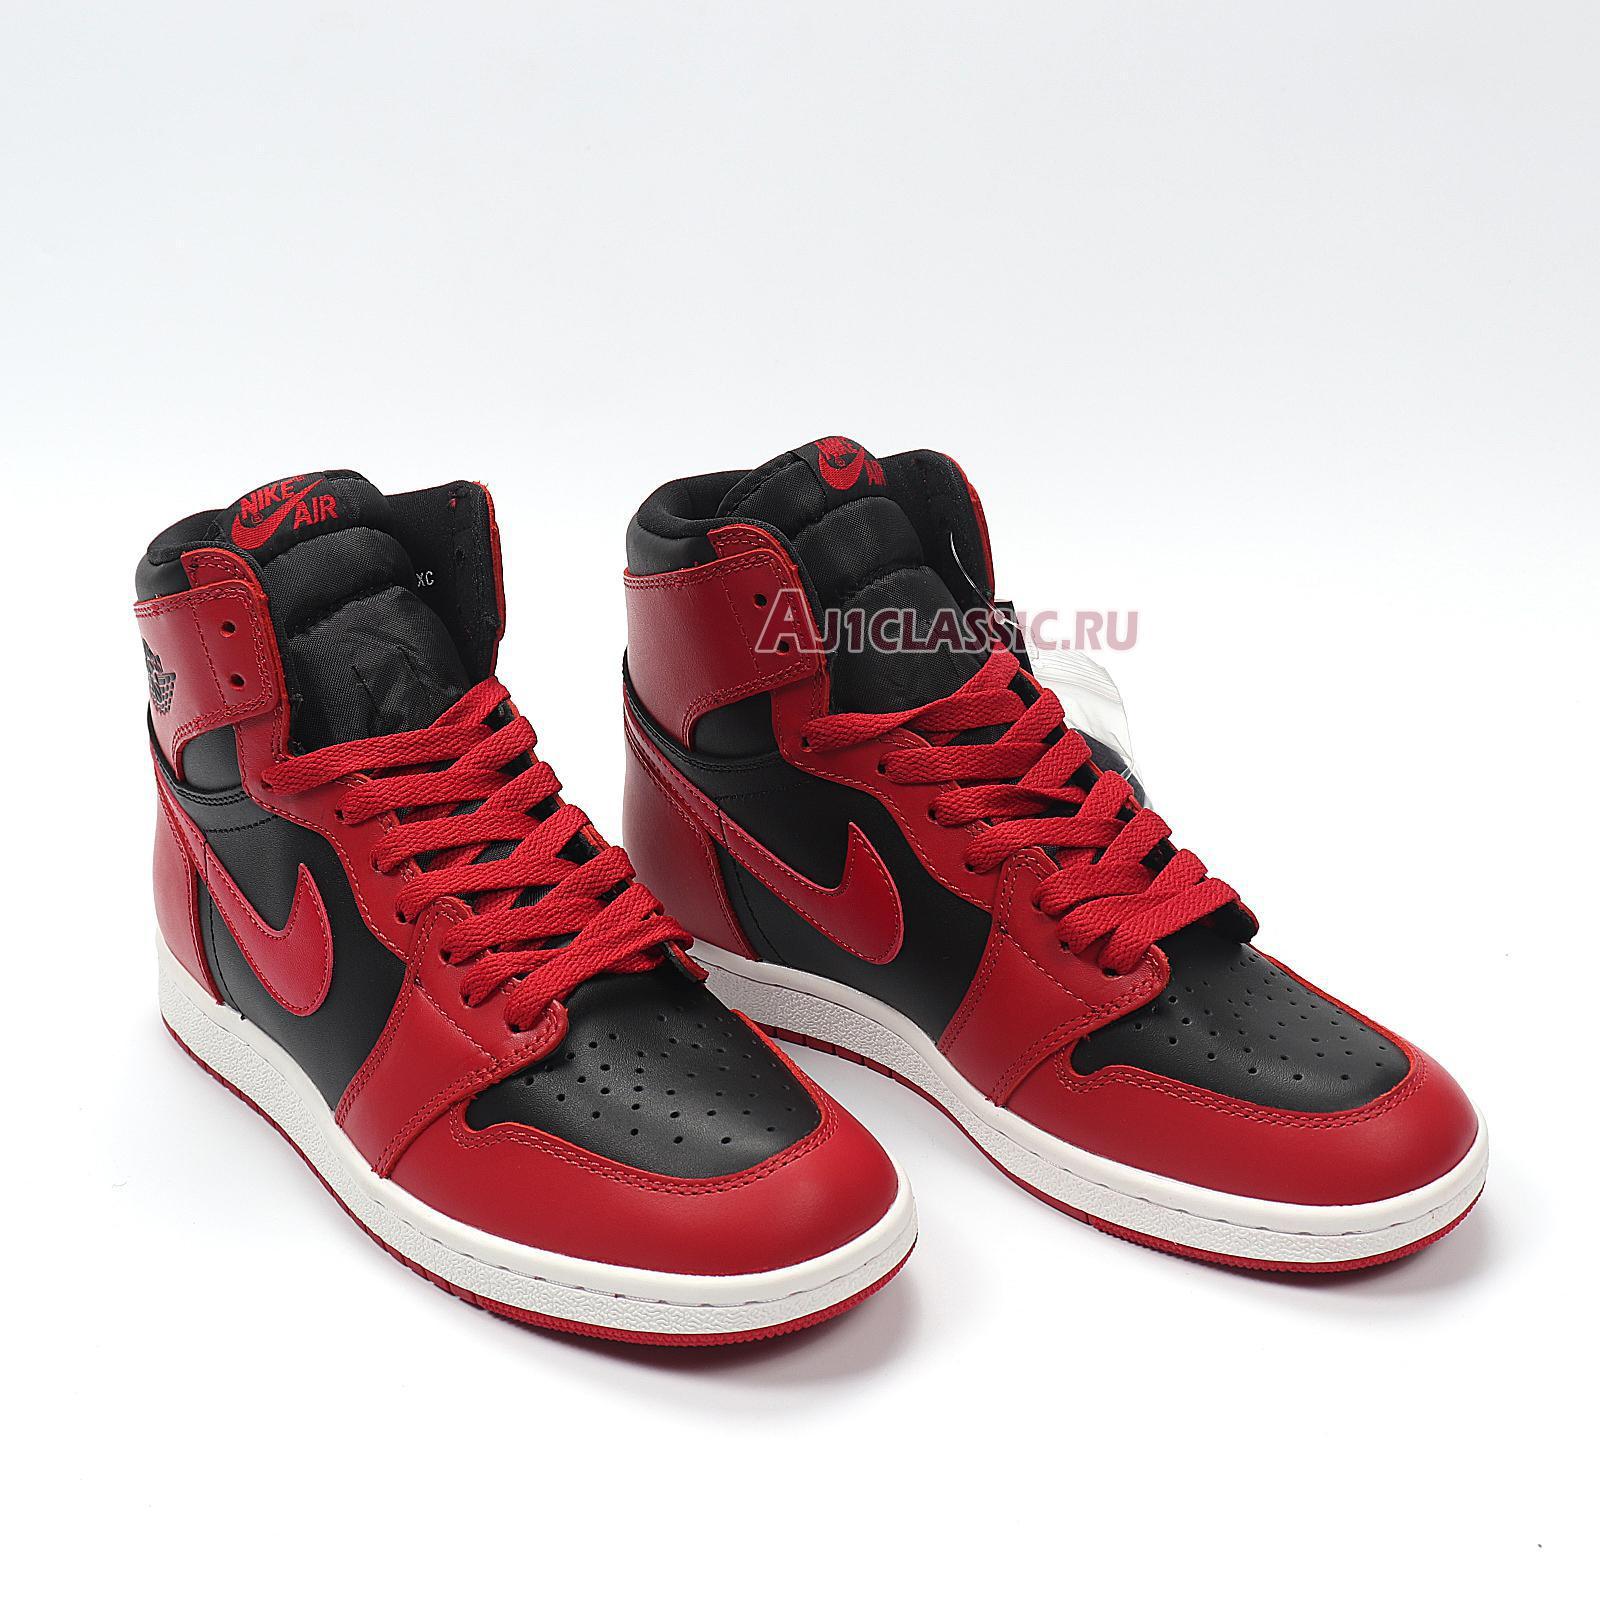 "Air Jordan 1 Retro High ""85 Varsity Red"" BQ4422-600"